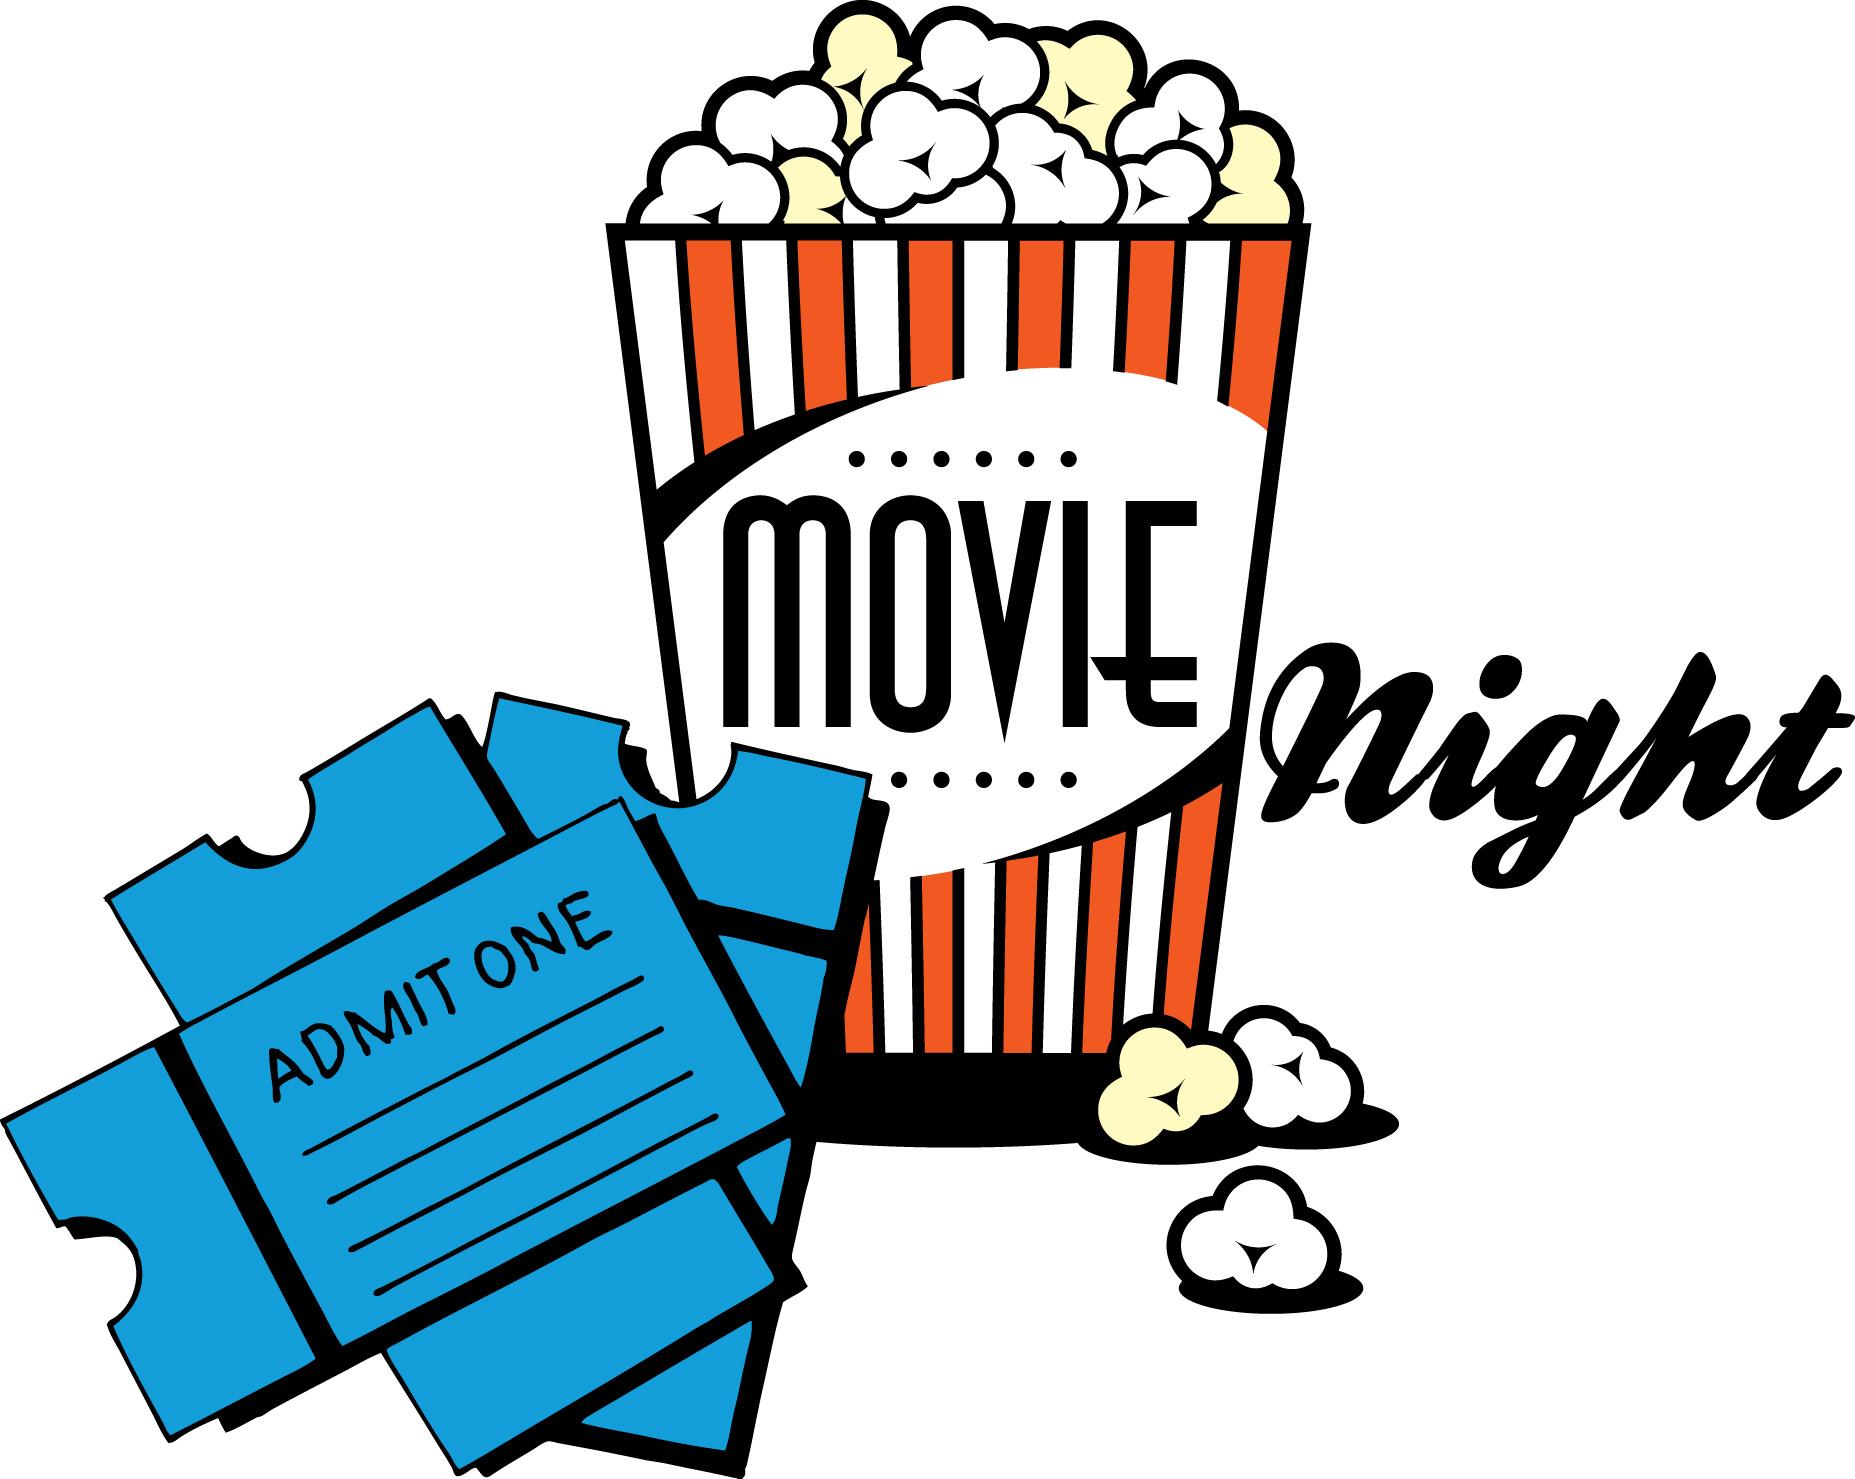 movie night popcorn clipart-movie night popcorn clipart-1